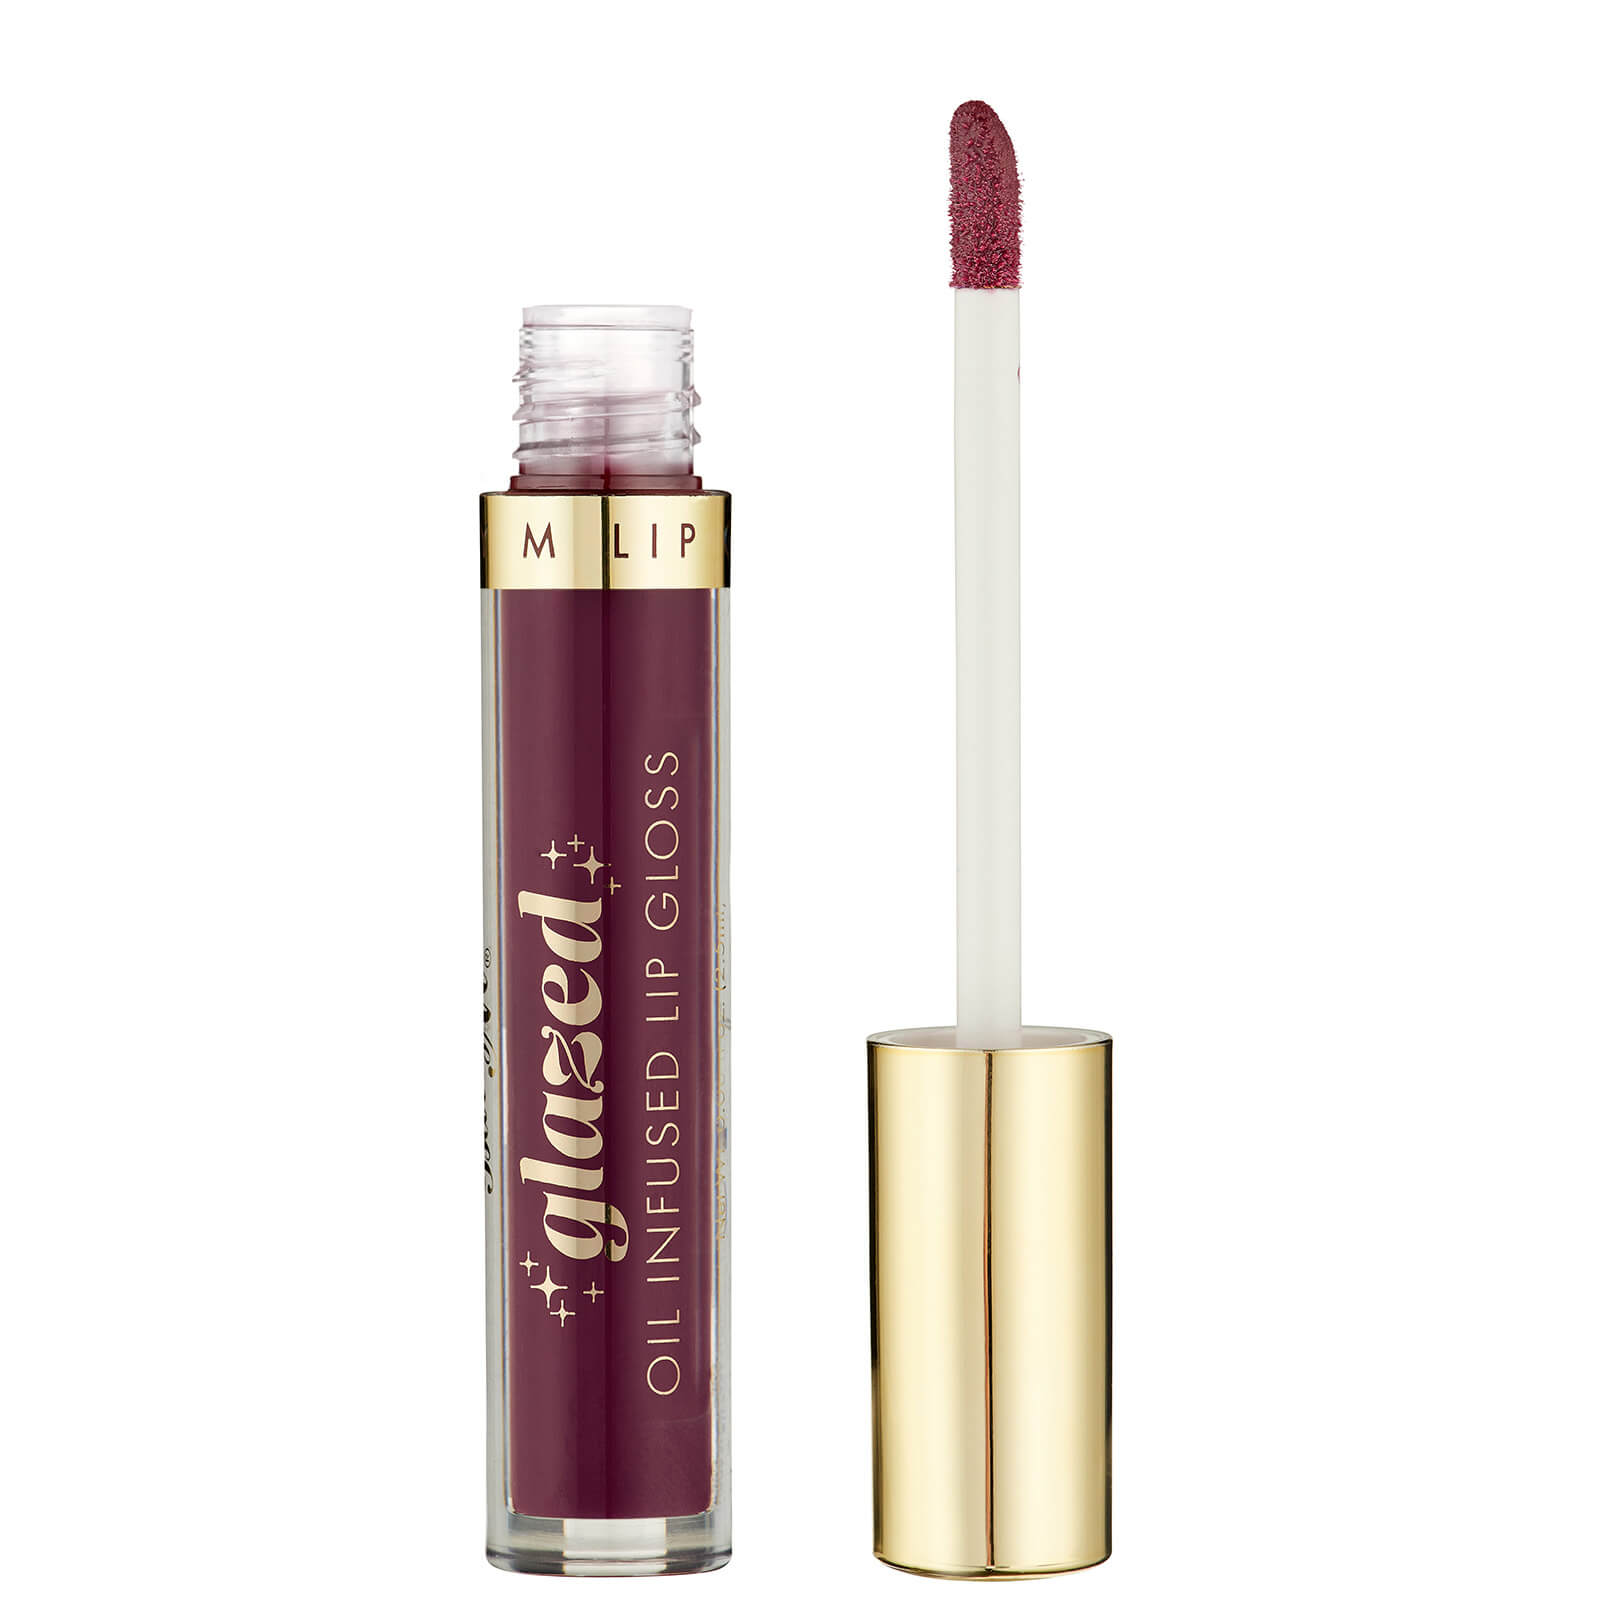 Купить Barry M Cosmetics Glazed Oil Infused Lip Gloss 2.5ml (Various Shades) - So Tempting